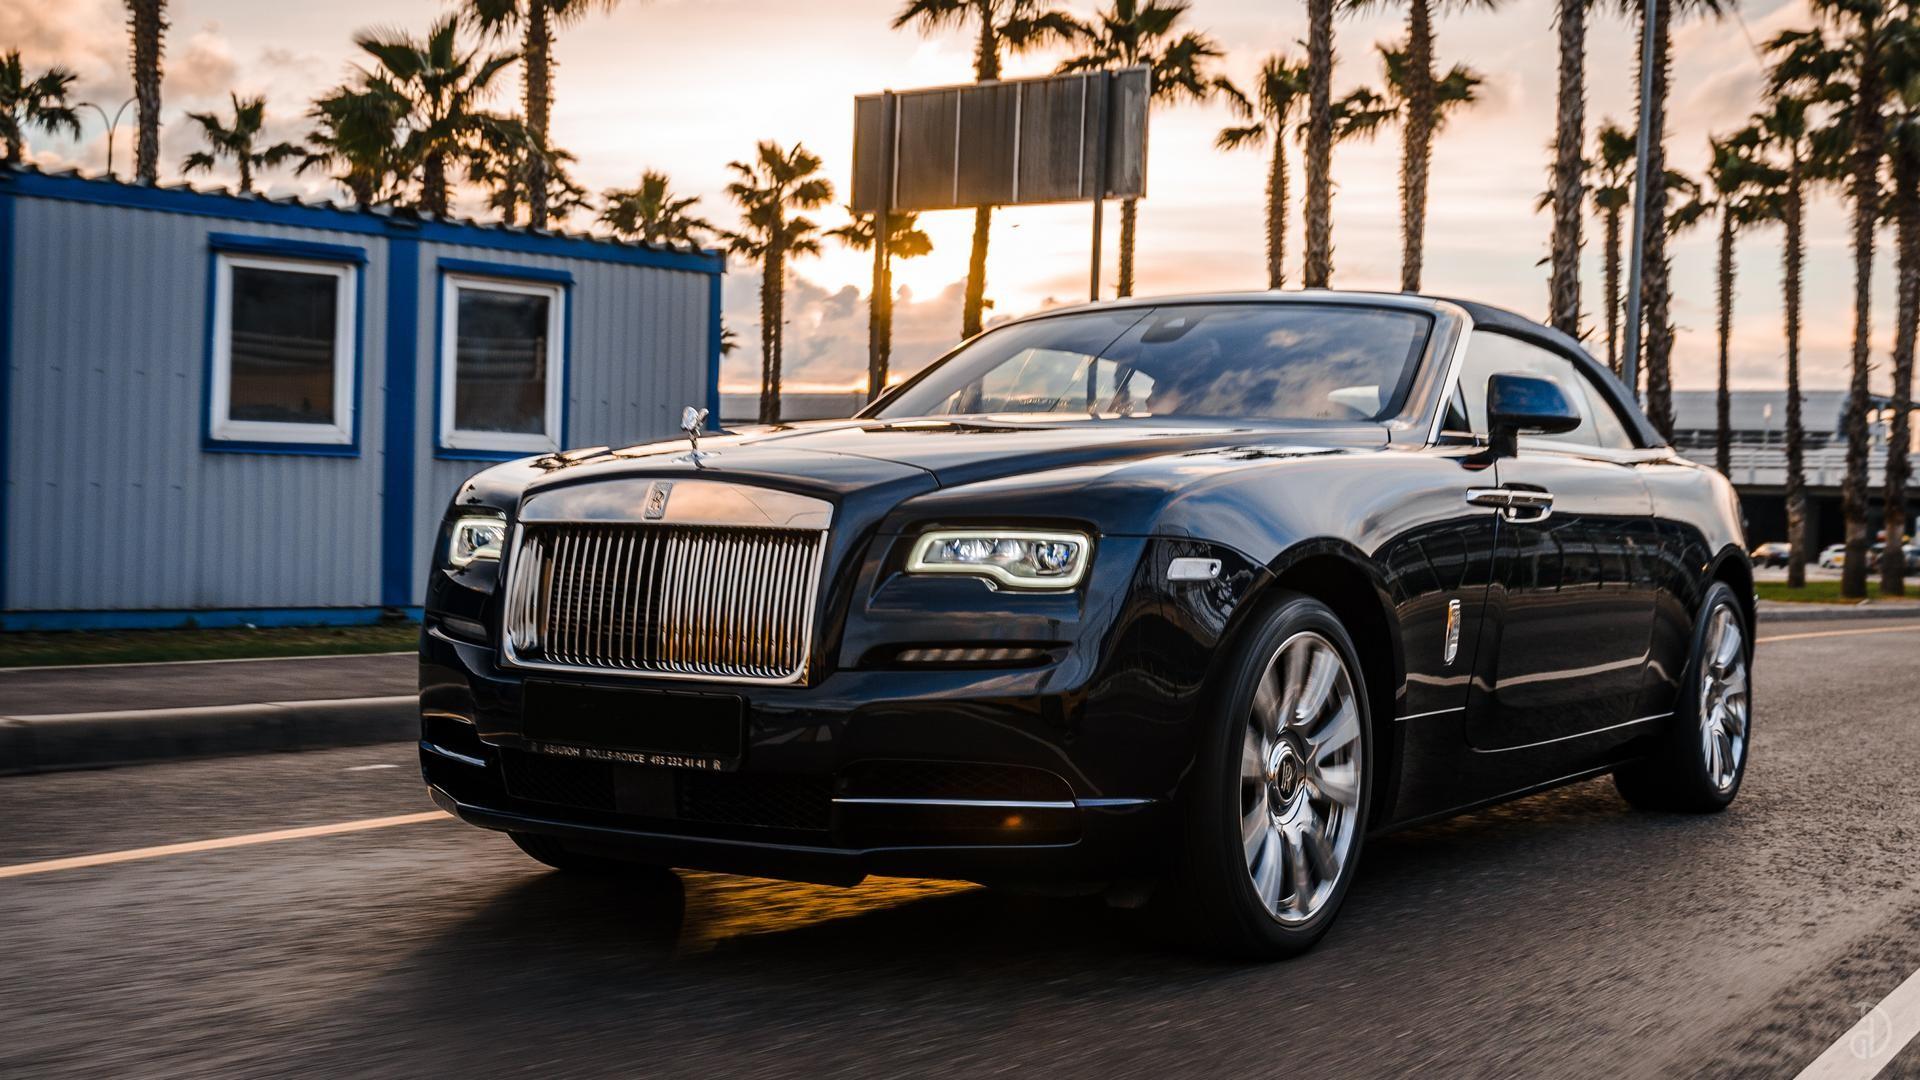 Аренда Rolls-Royce Dawn в Сочи. Фото 2